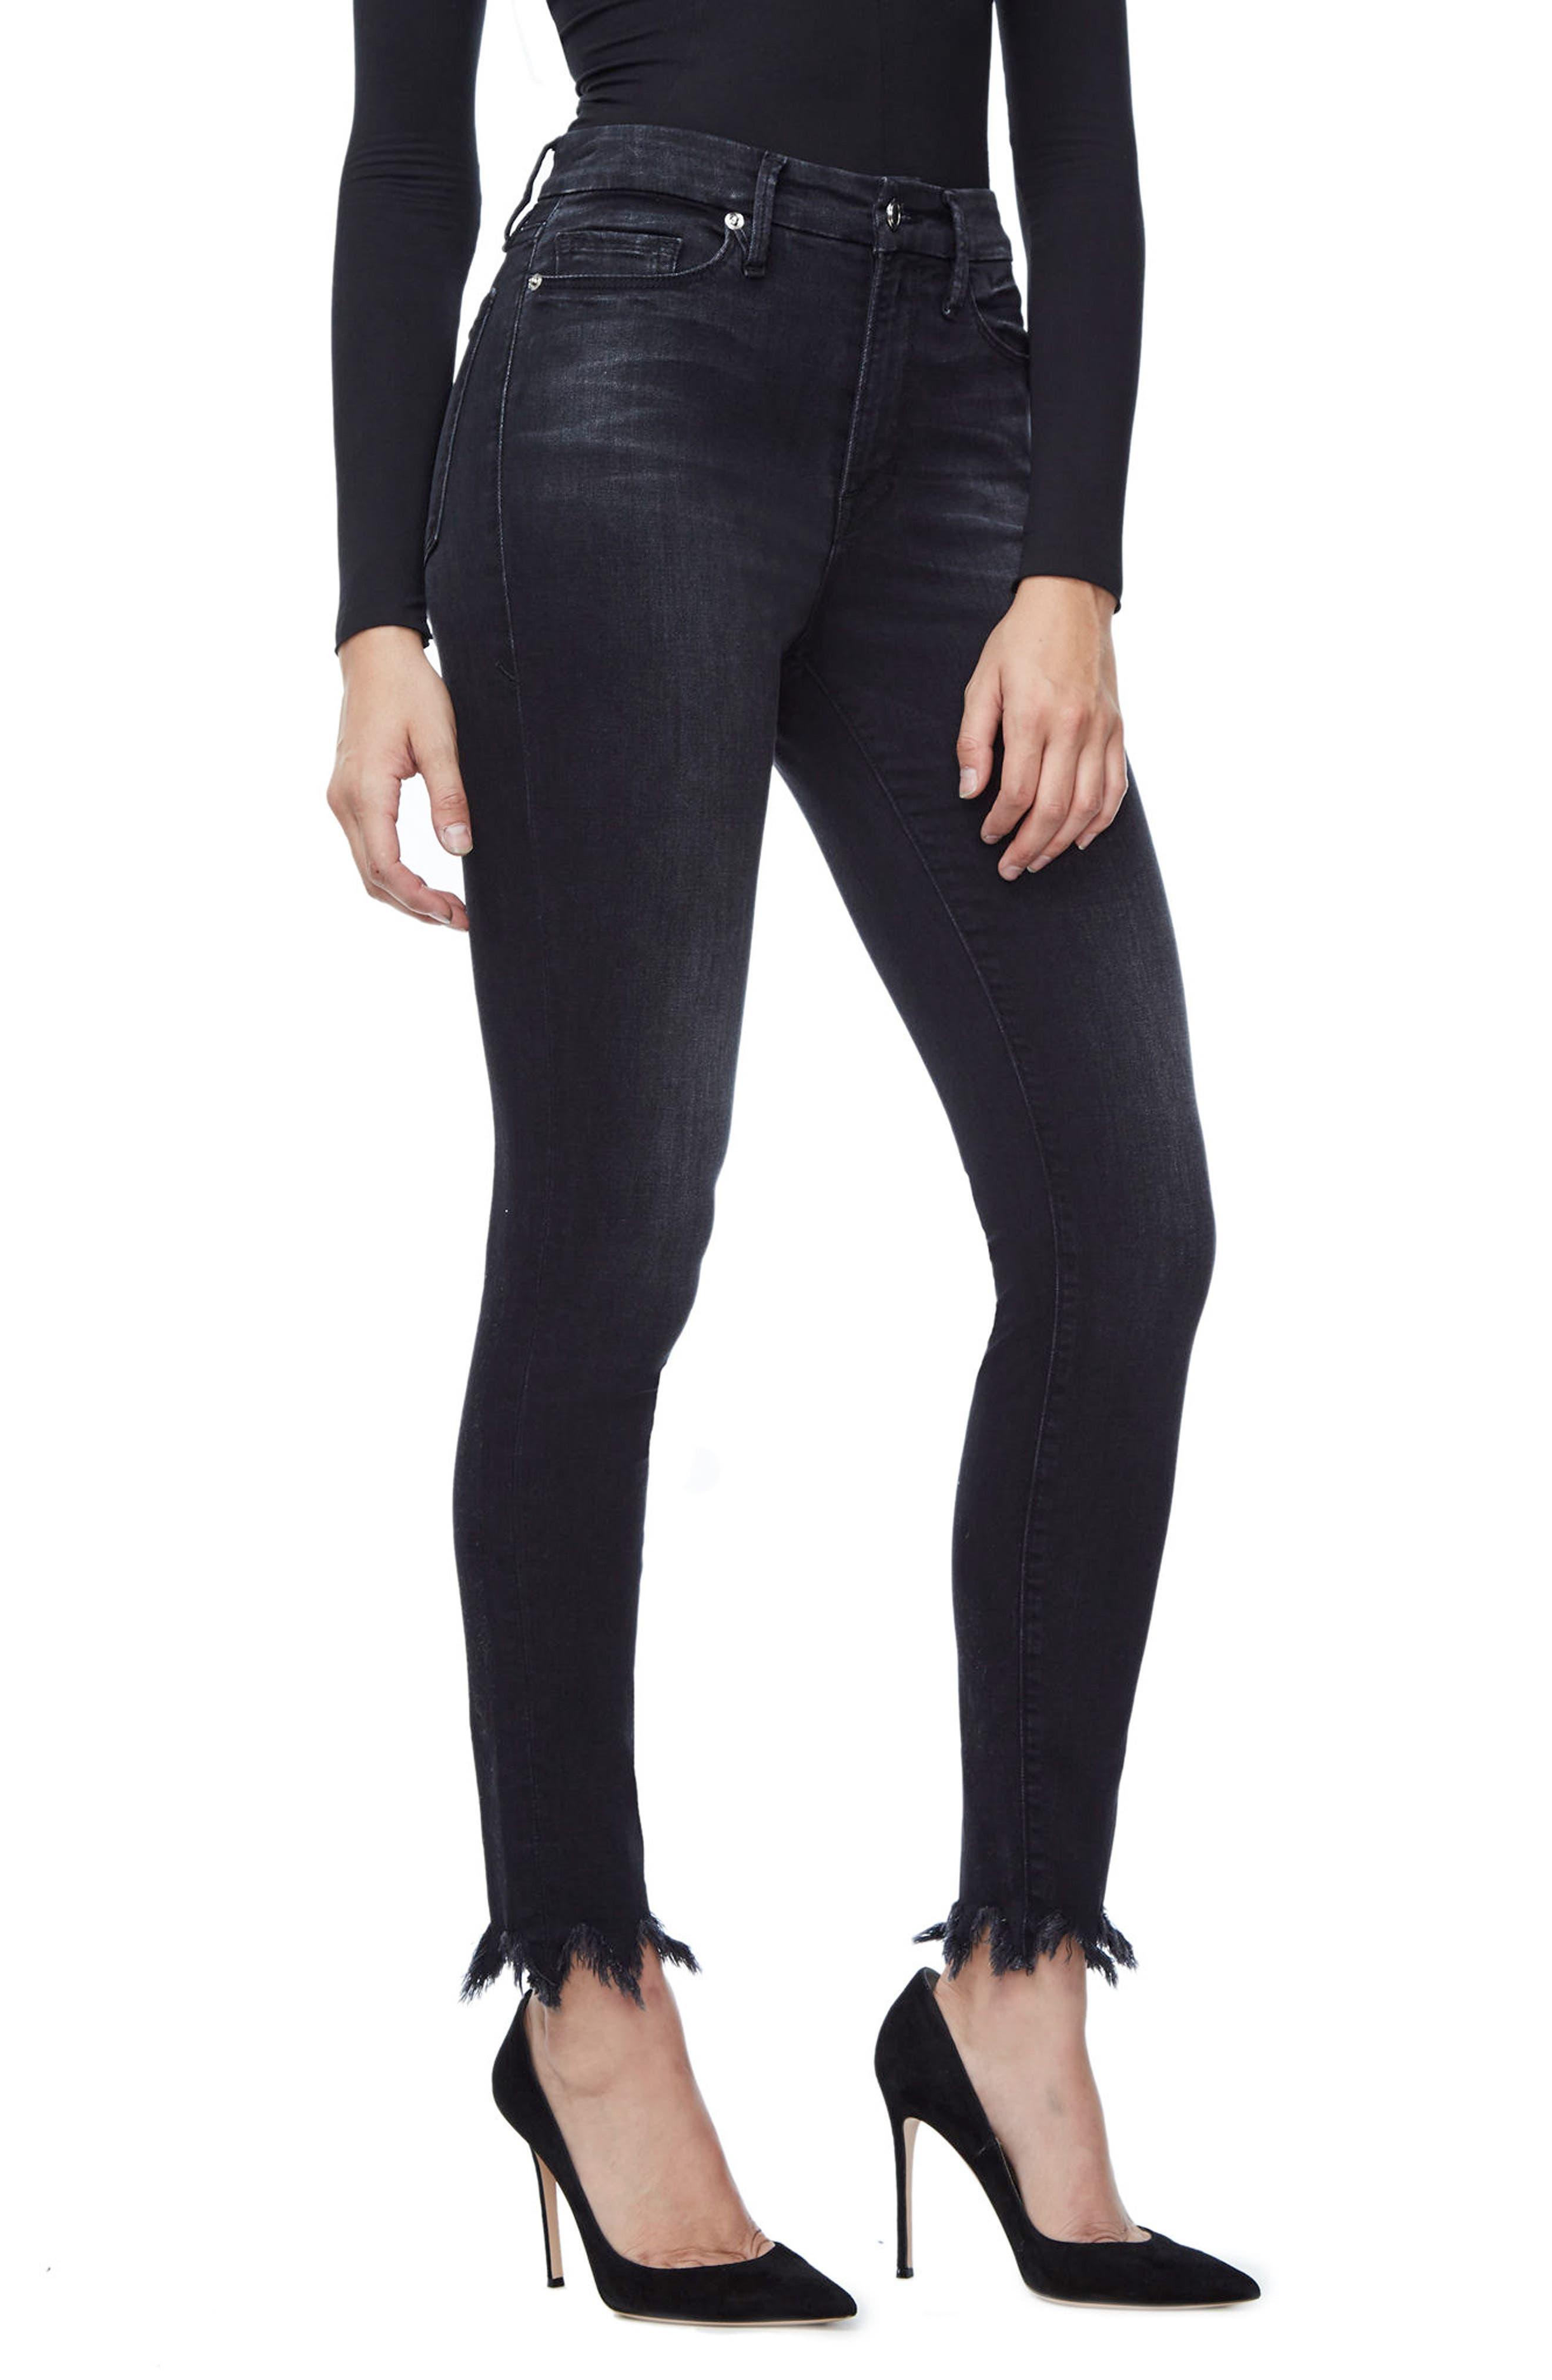 Alternate Image 1 Selected - Good American Good Waist Fray Hem Skinny Jeans (Black 012) (Extended Sizes)